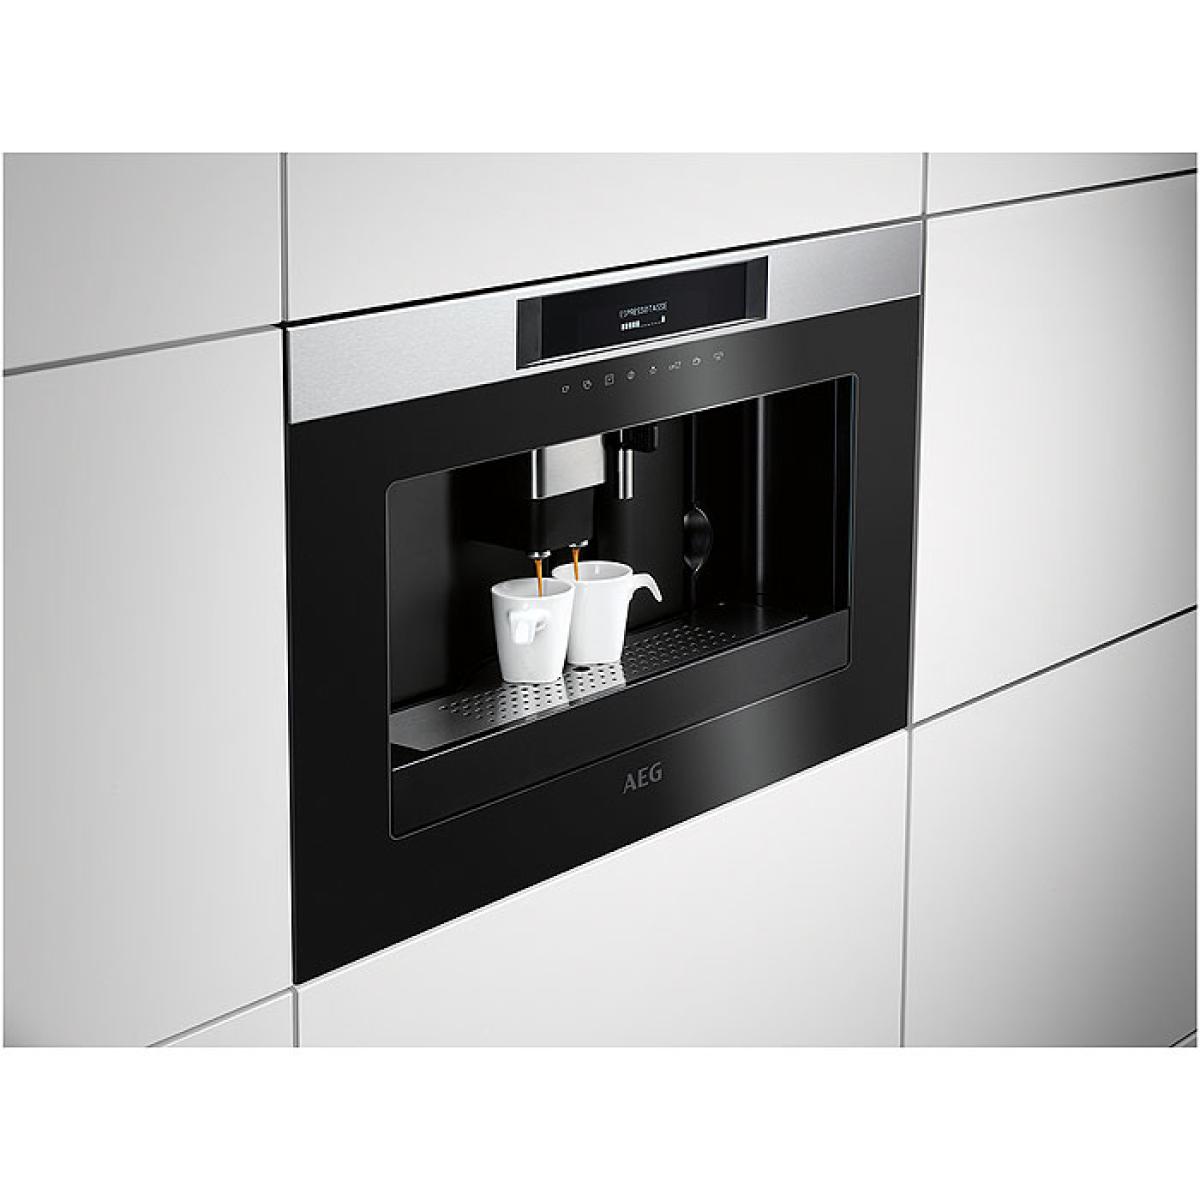 aeg kkk884500m einbau kaffeevollautomat 45cm hoch antifinger edelstahl beschichtung g nstig. Black Bedroom Furniture Sets. Home Design Ideas